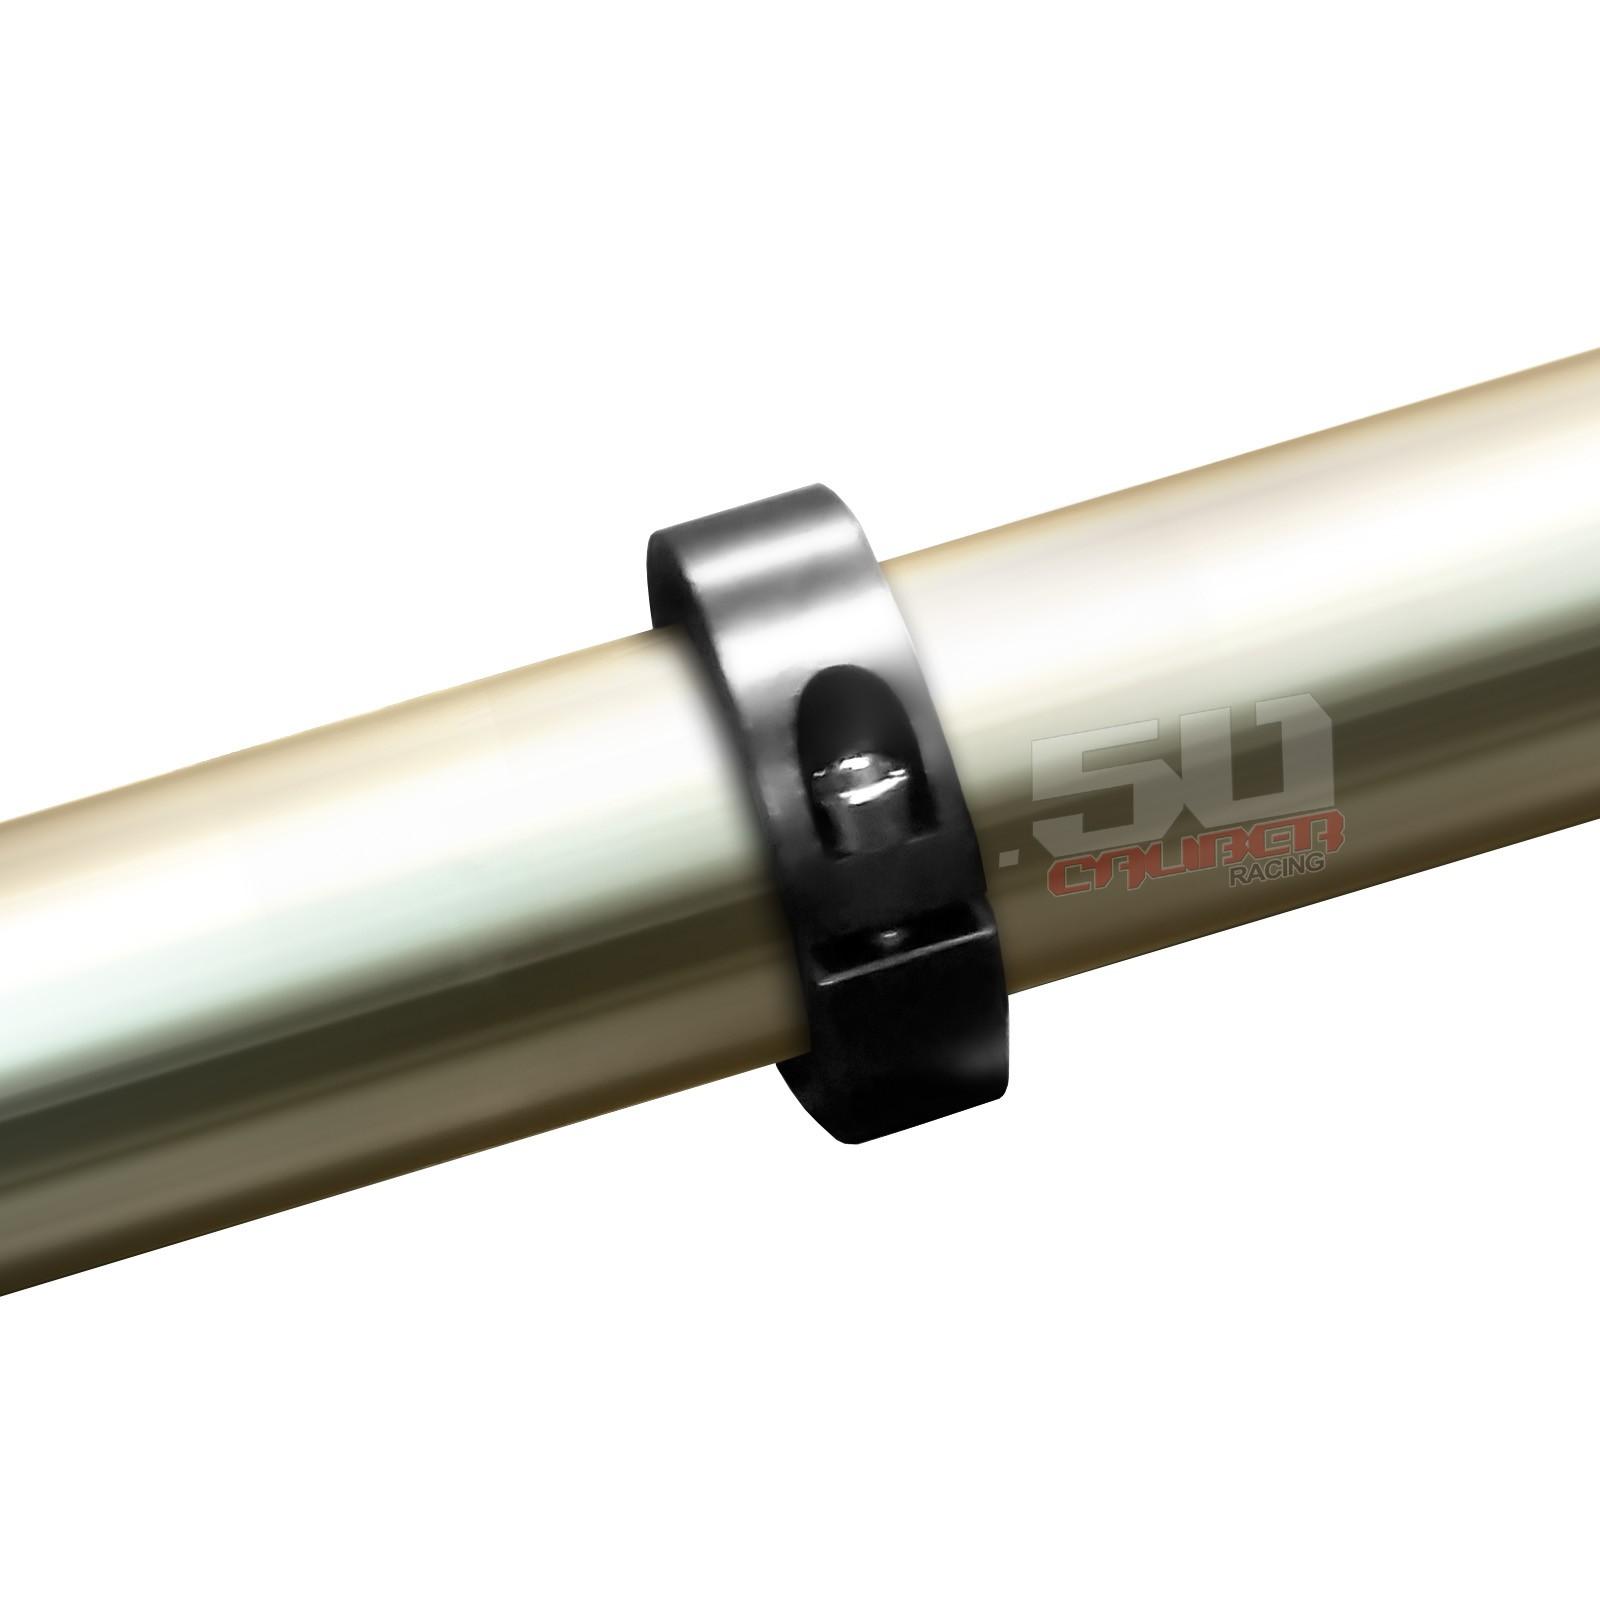 "Hydraulic Fluid Air Pneumatic Pk2 Tube Clamp Twin 13.5mm 1//4/""n.b"